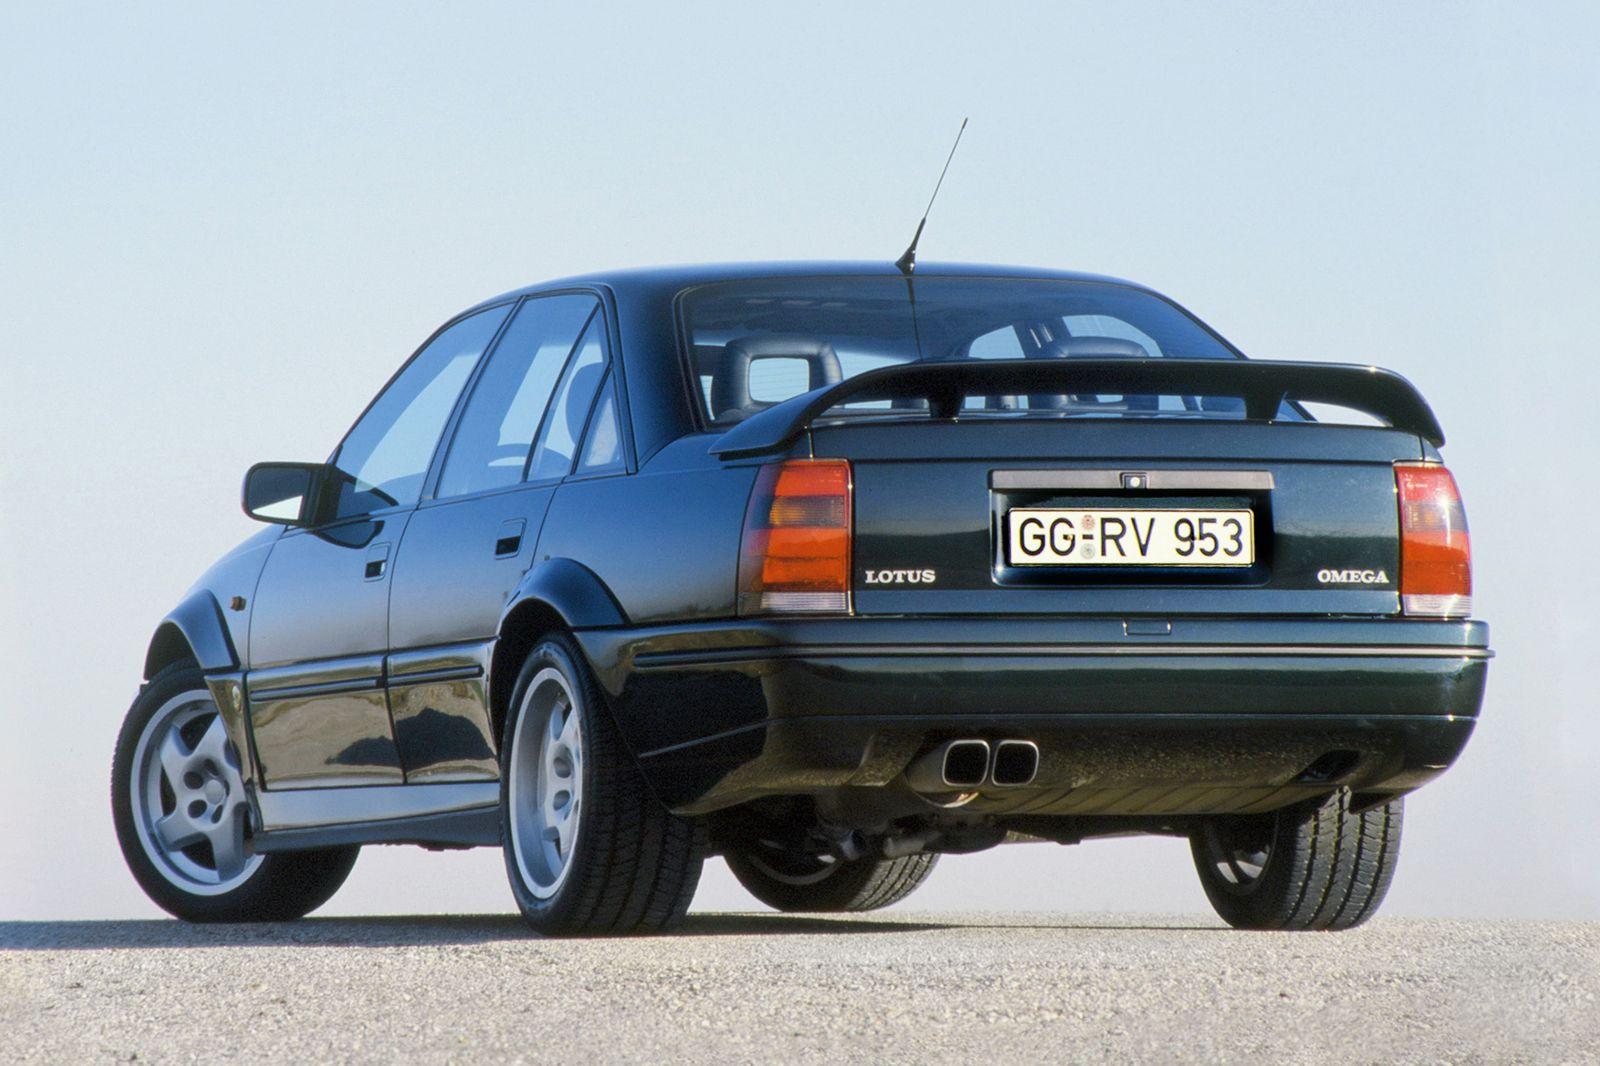 1991 Lotus Omega